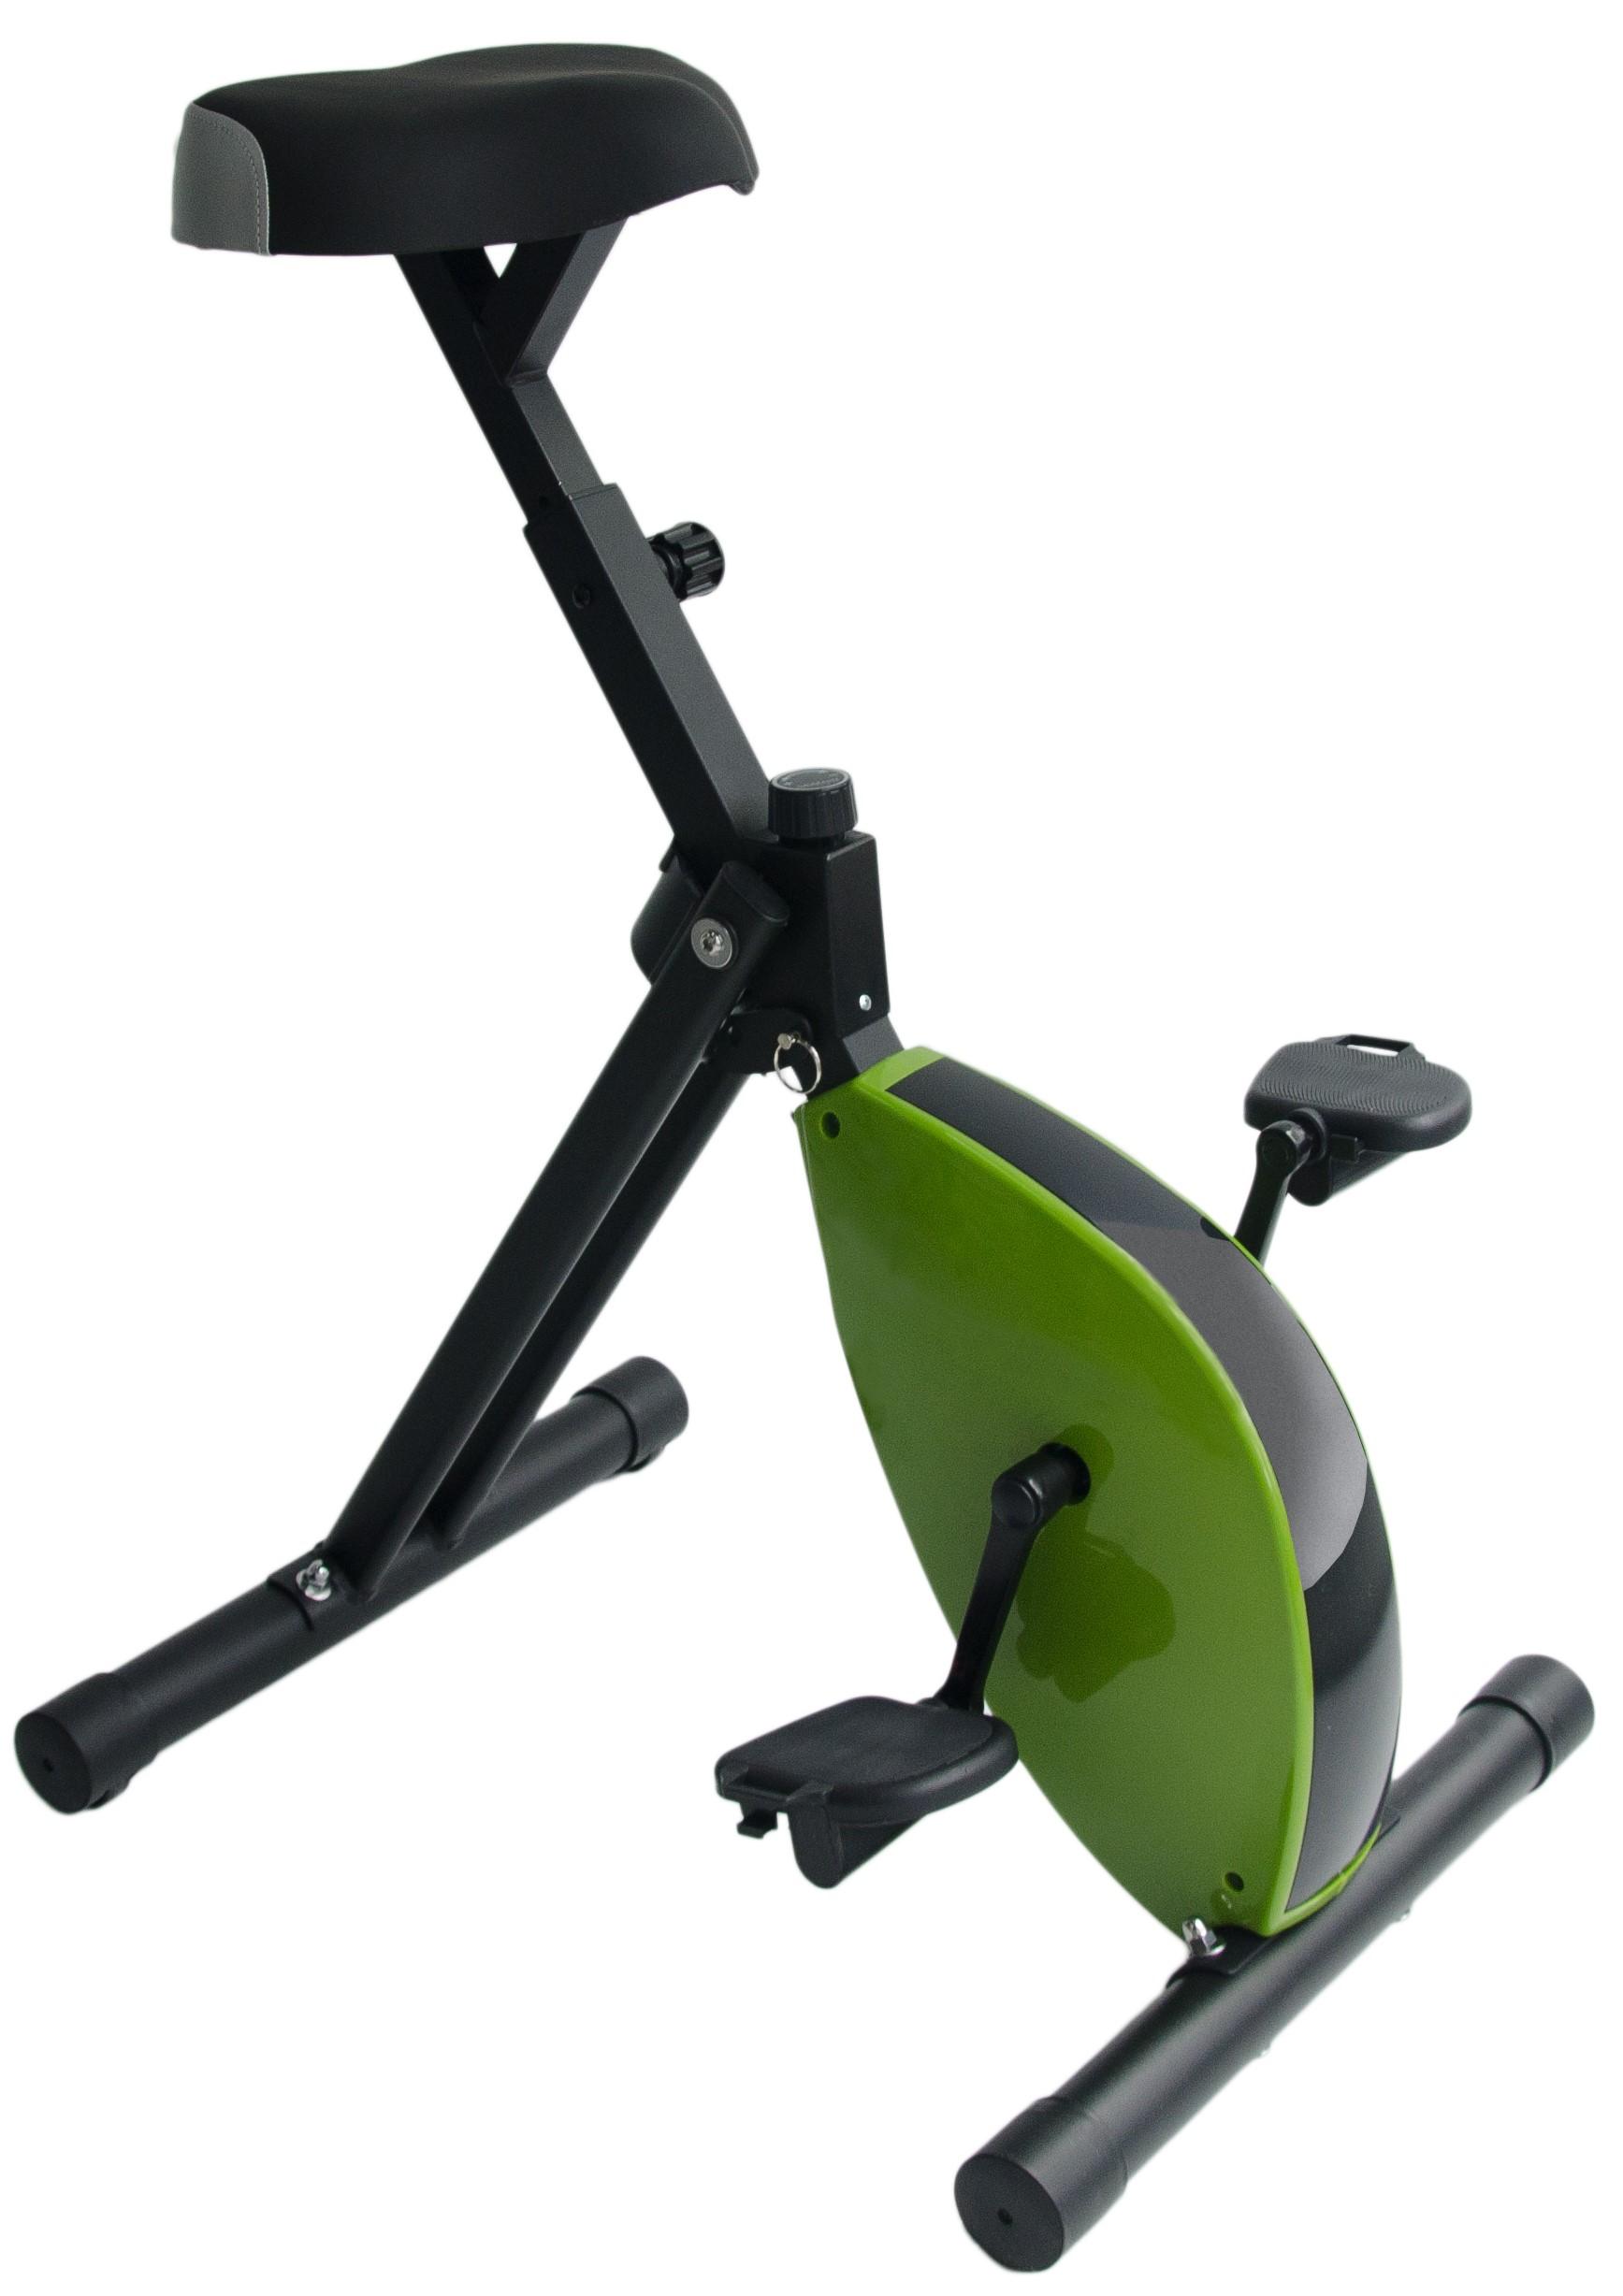 Deskbike Groen Zwart